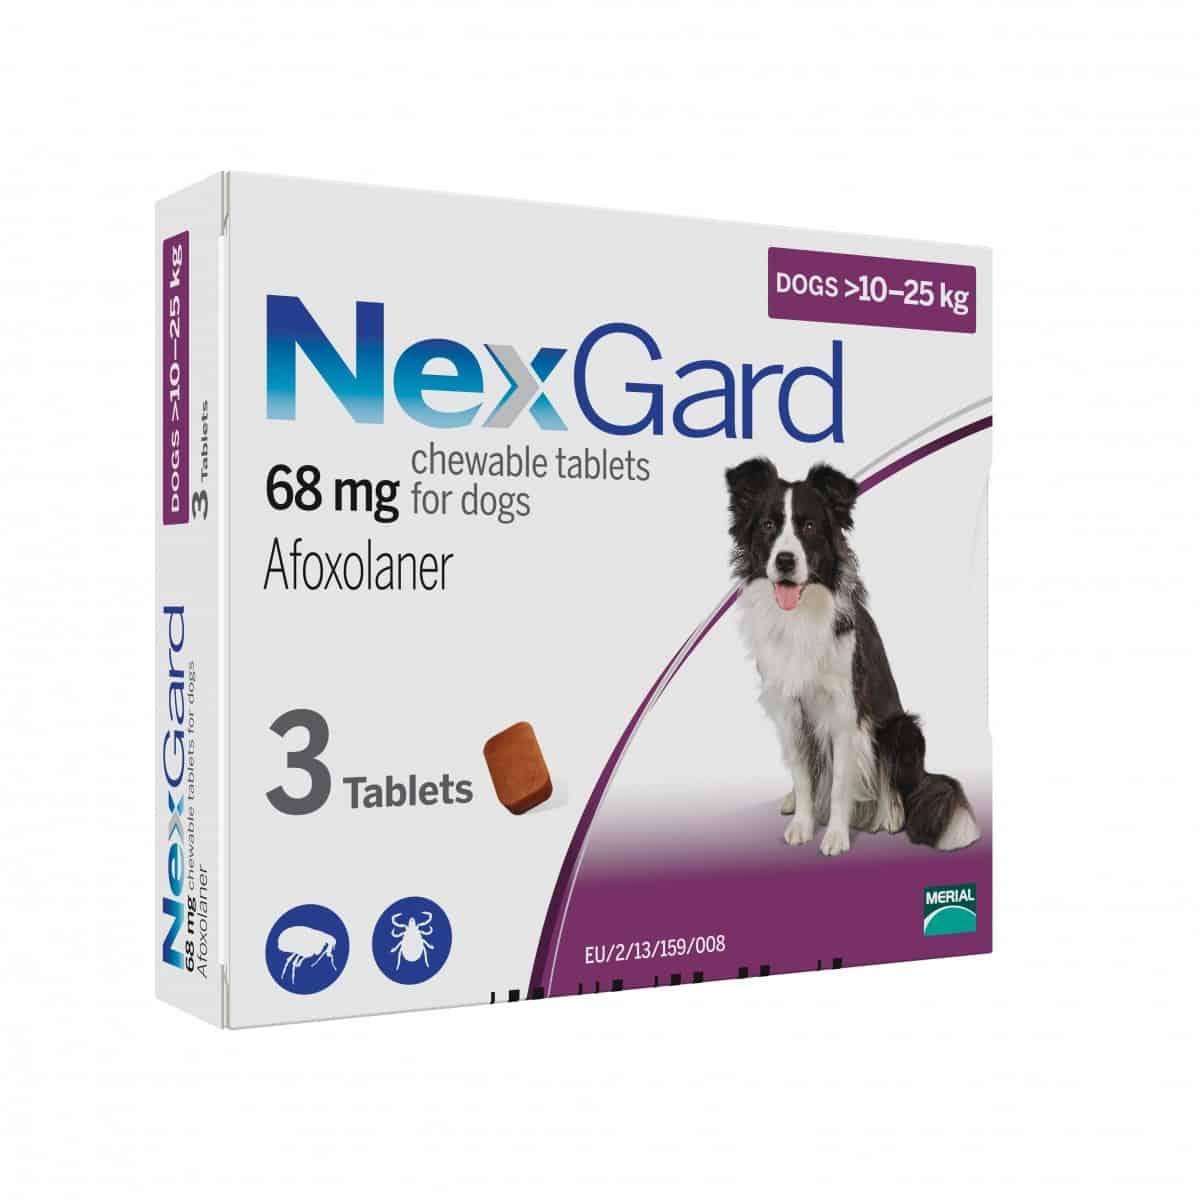 Nexgard - >10kg to 25kg